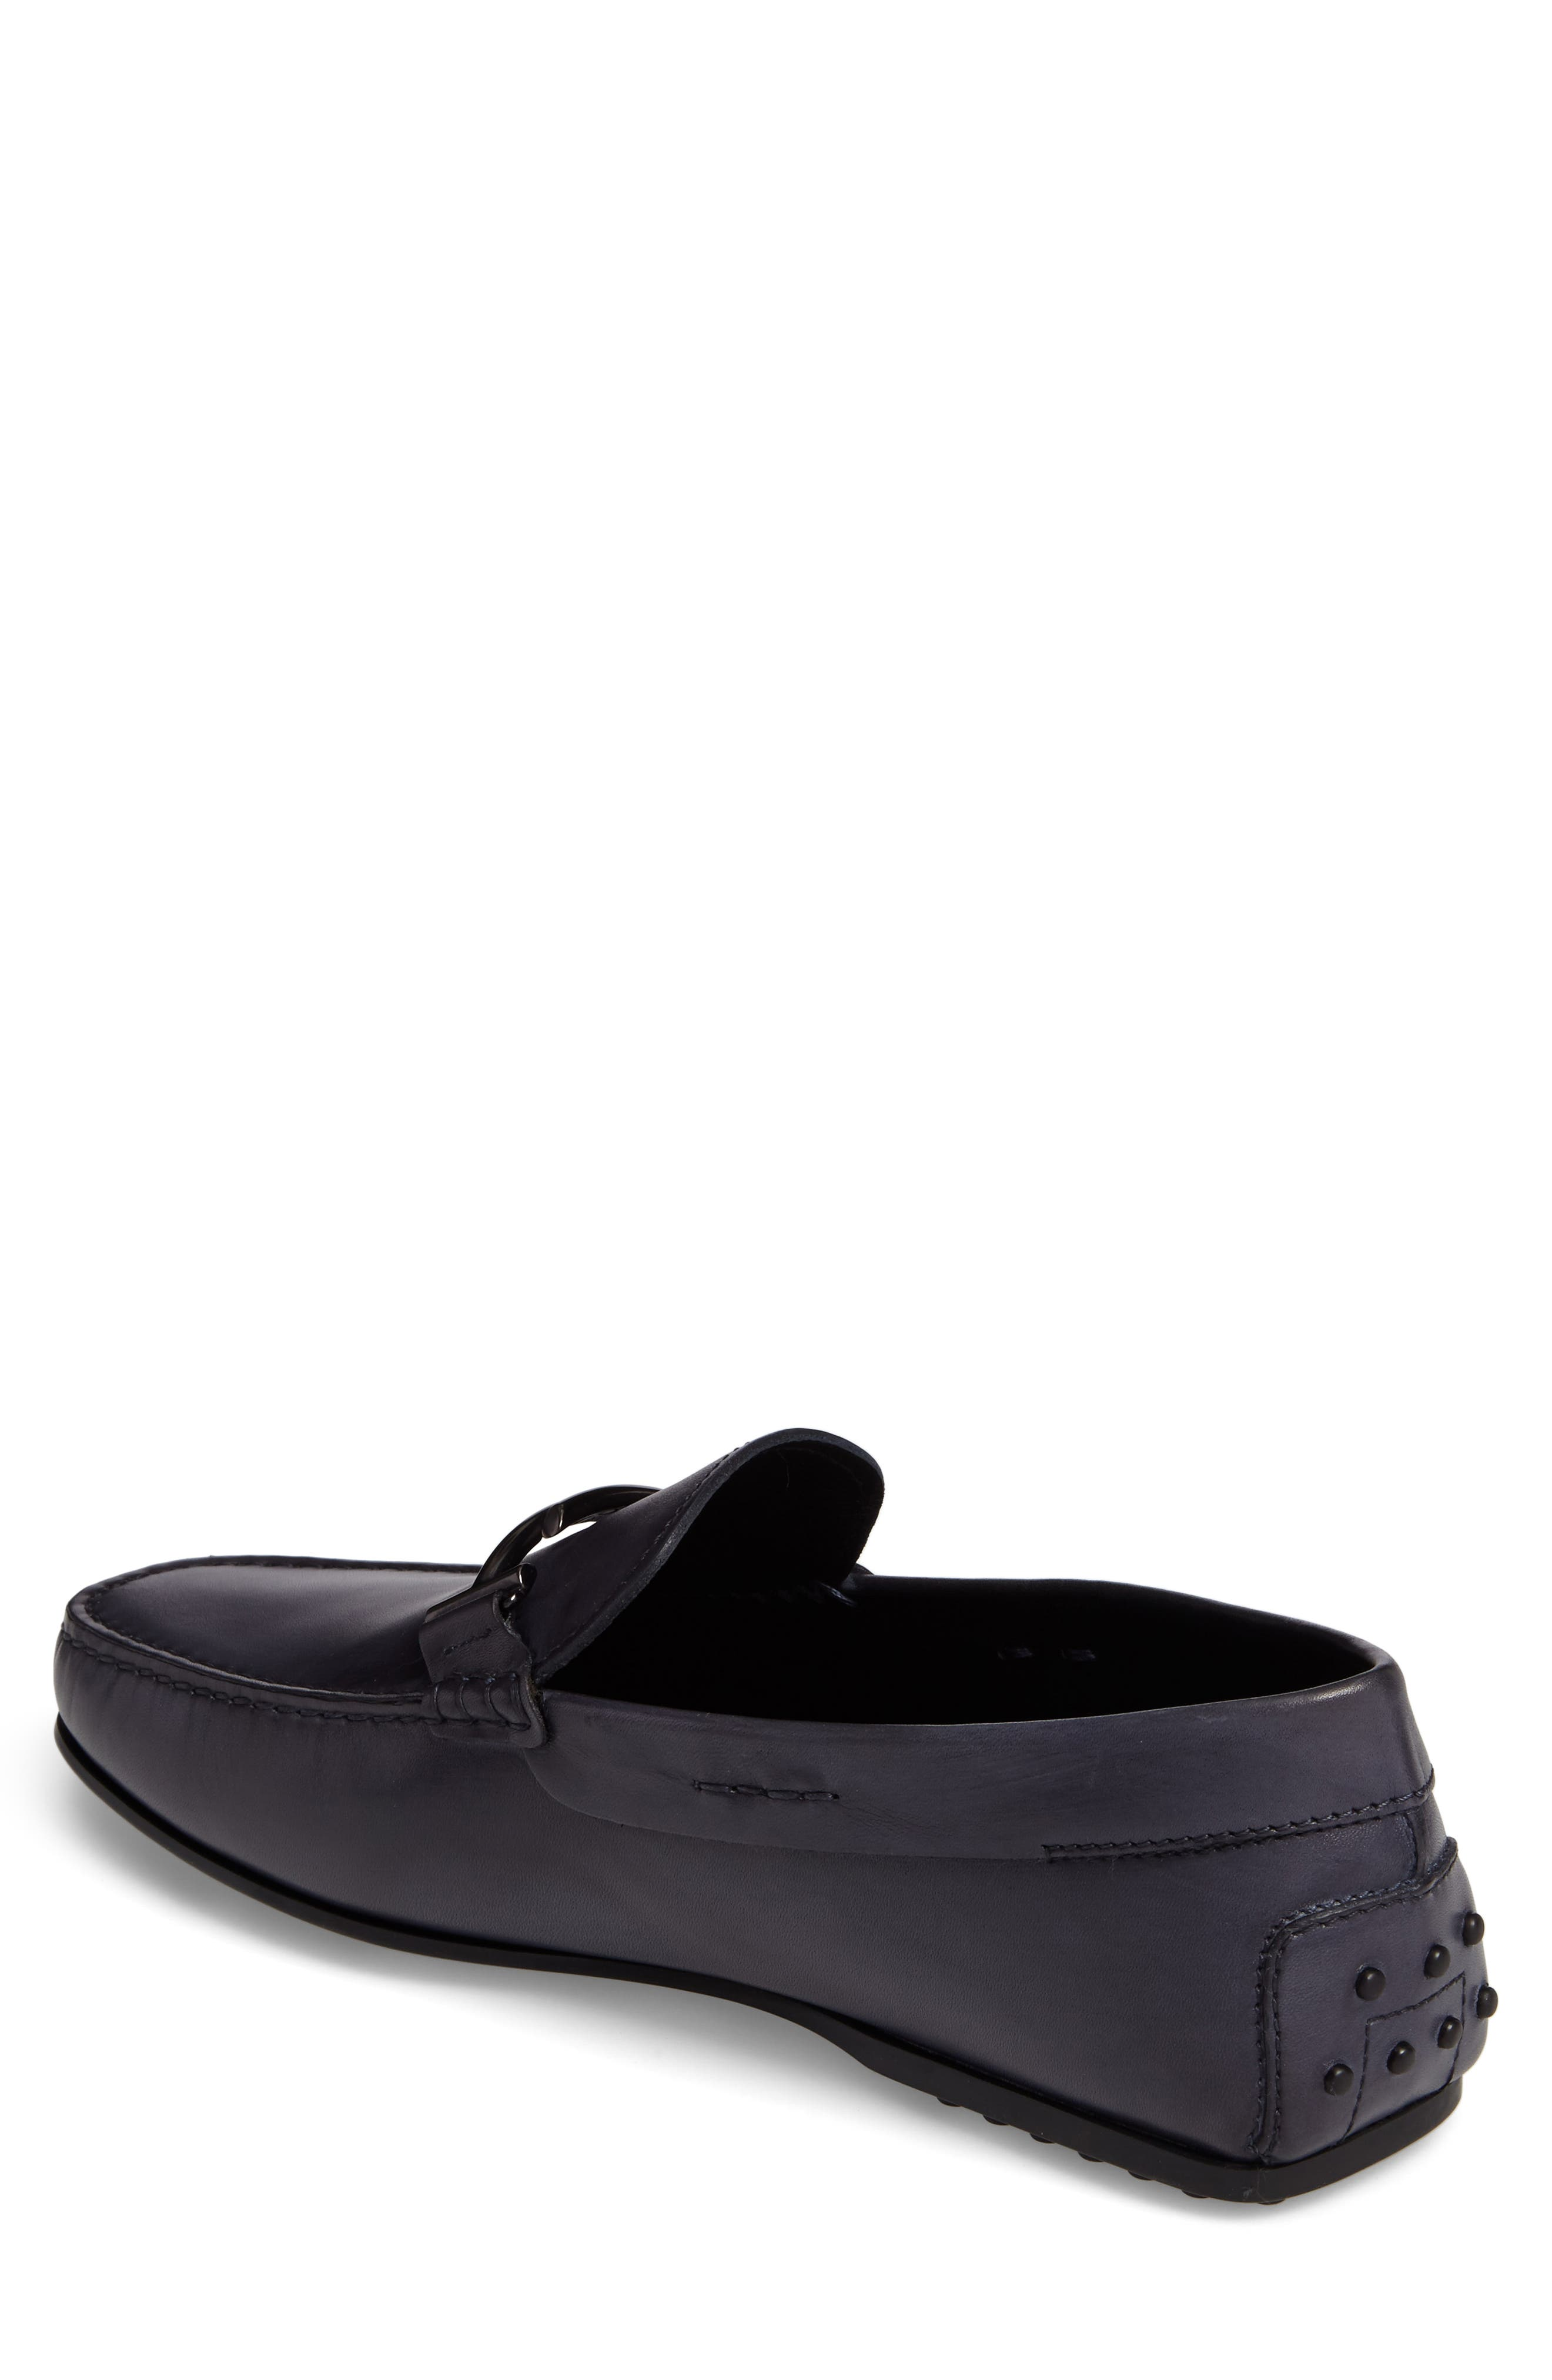 Gommini Driving Shoe,                             Alternate thumbnail 2, color,                             Dark Grey Leather